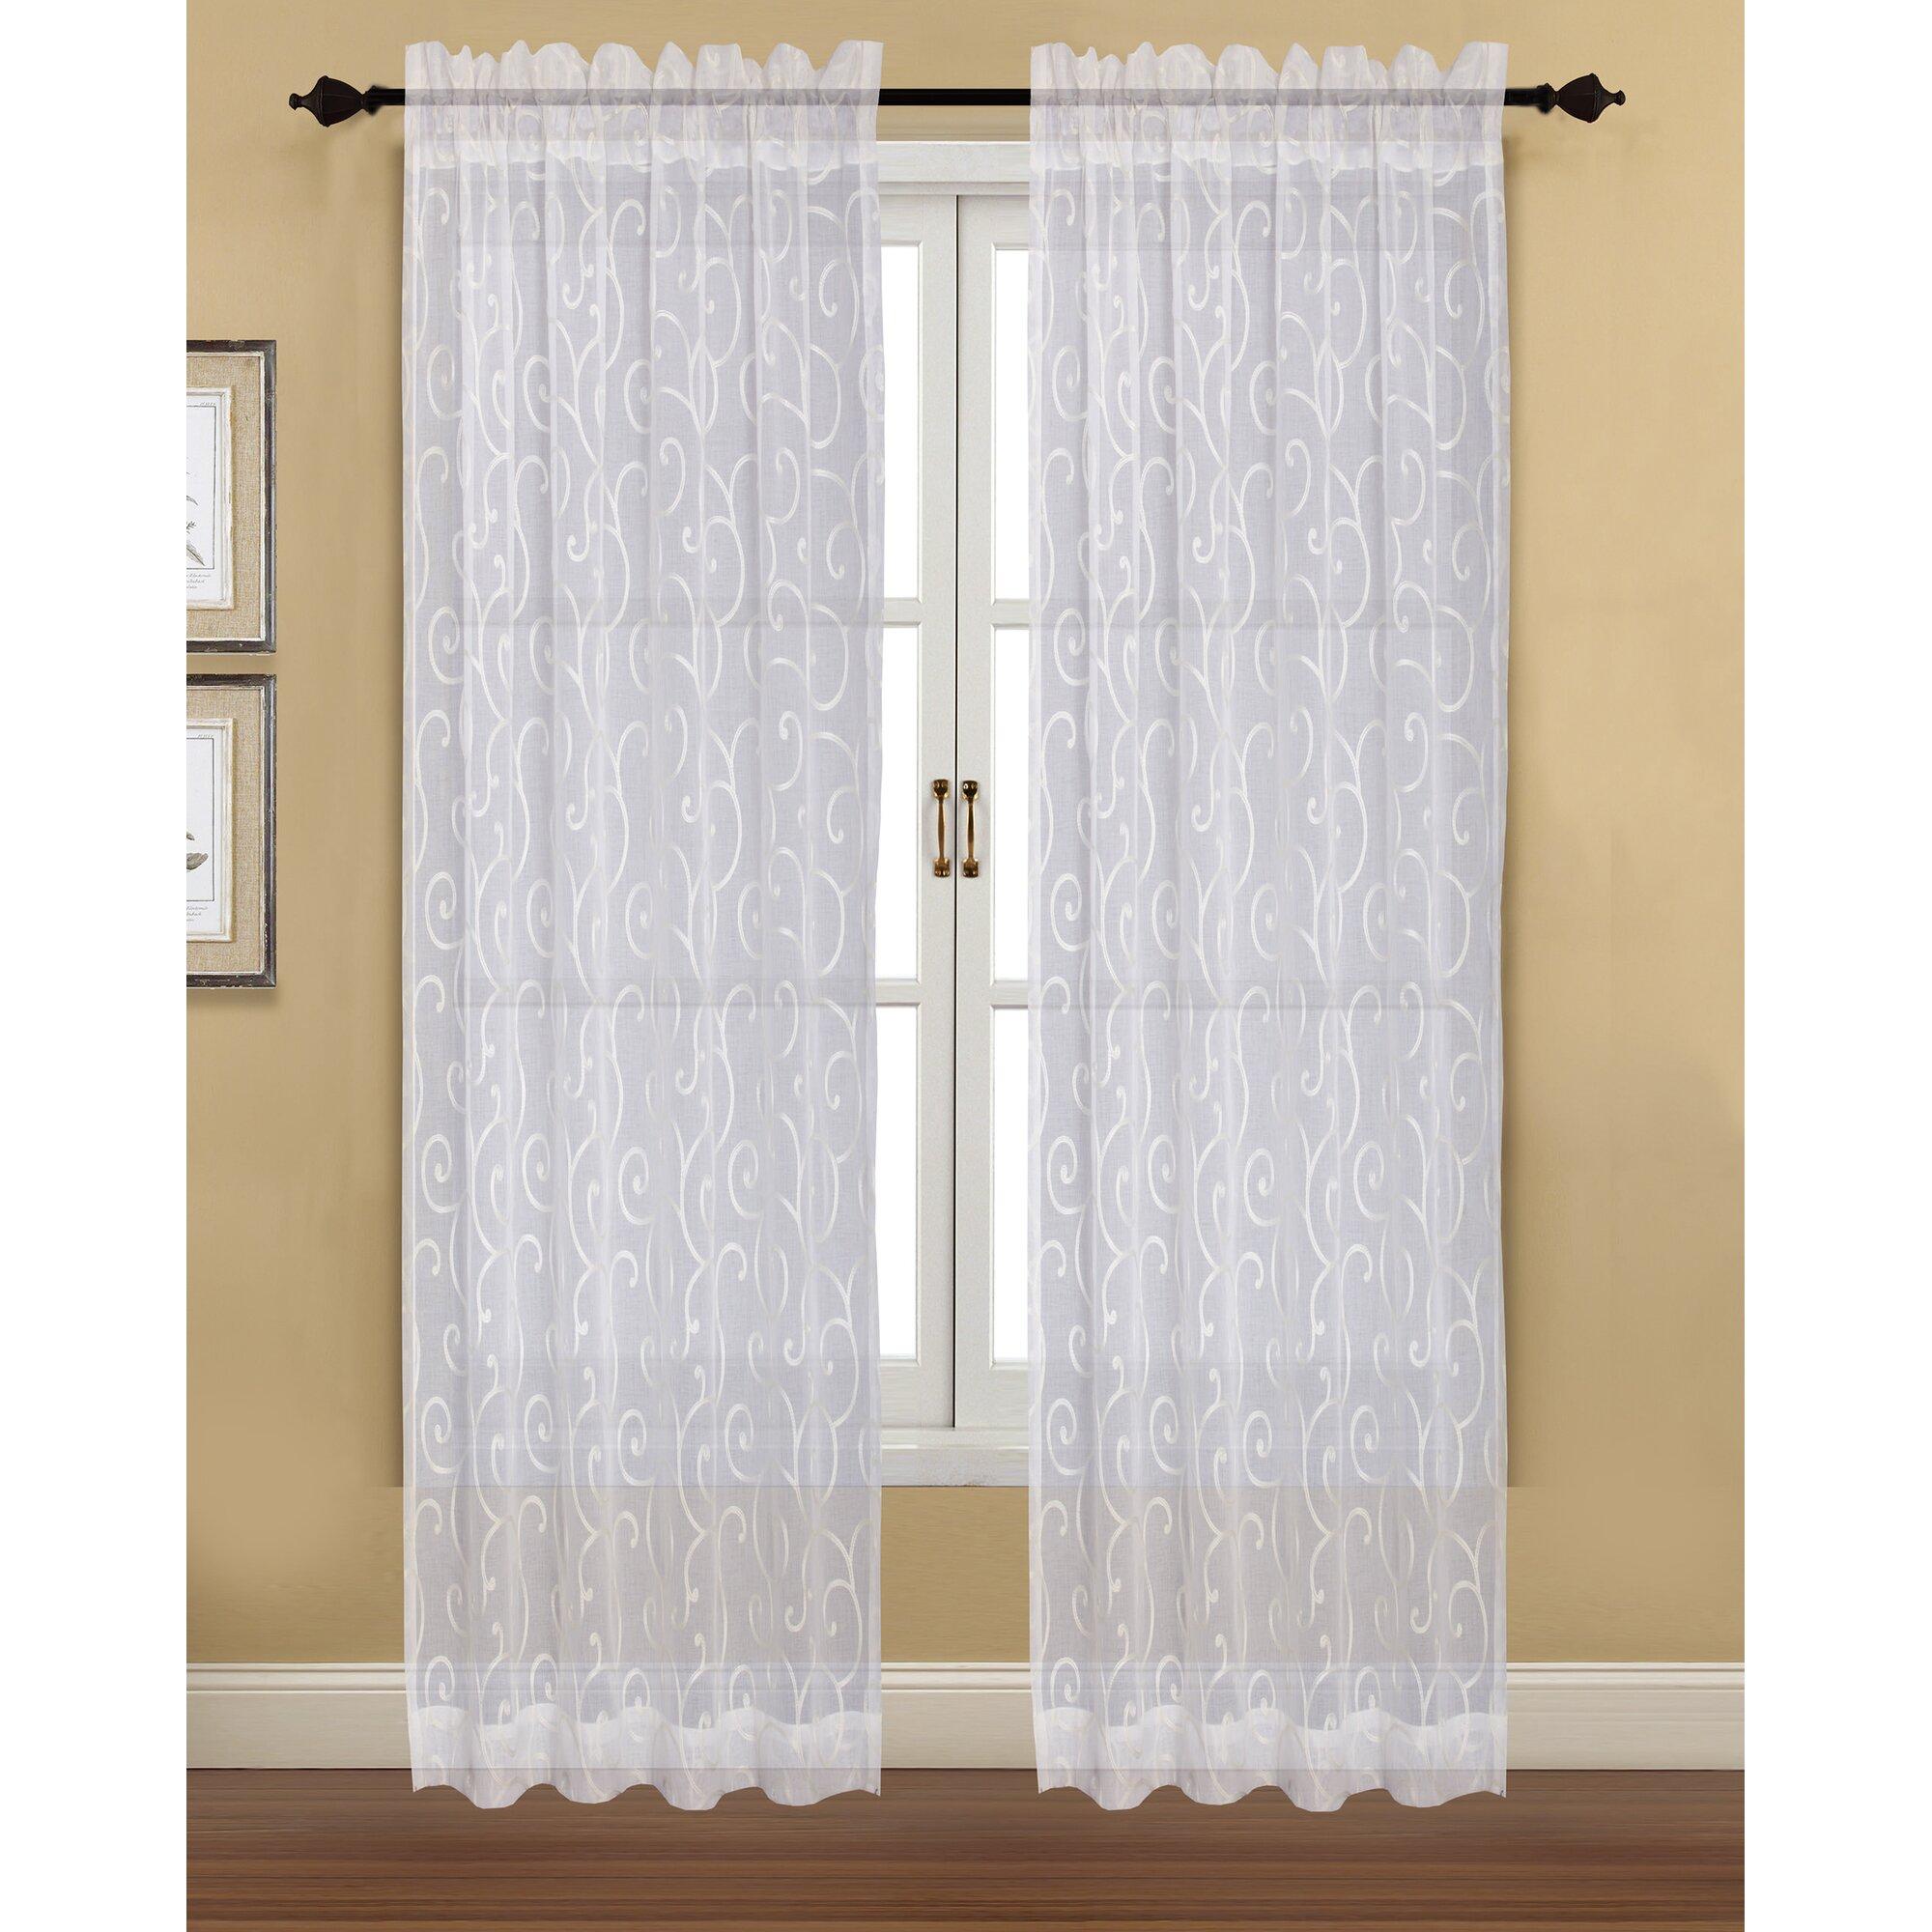 F R P Panel ~ Hfi blair nature floral sheer rod pocket curtain panels